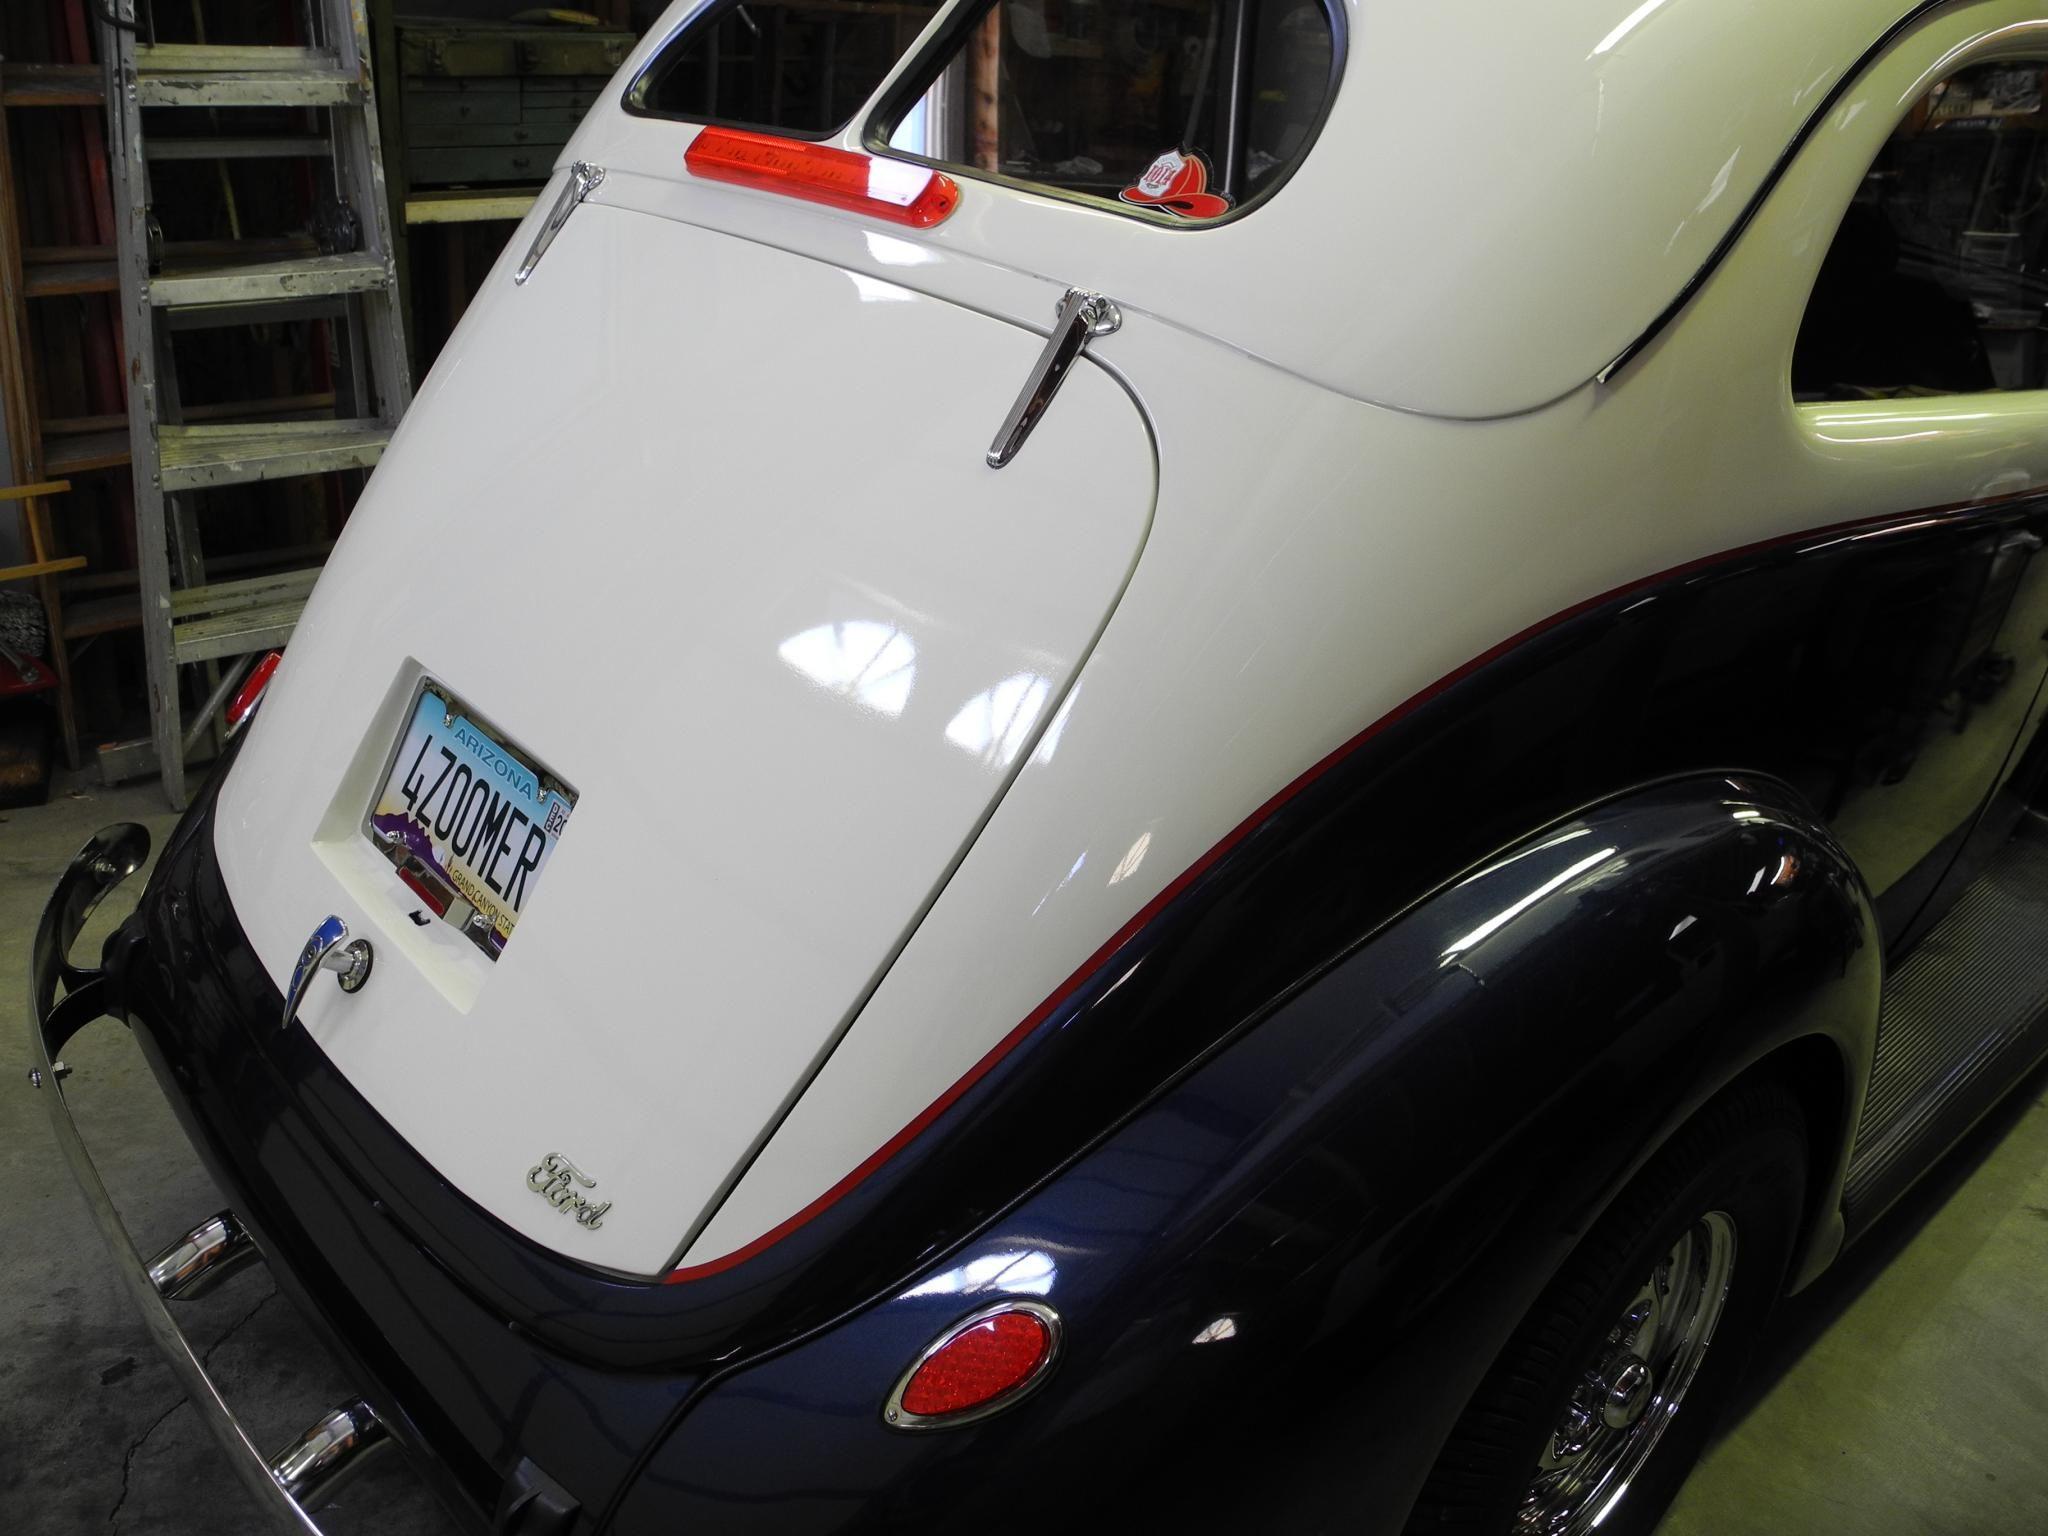 1937 Ford Sedan All Steel Deluxe Restored Sedan Tudor V8 For Sale Hotrodhotline In 2020 Sedan Ford Crate Motors